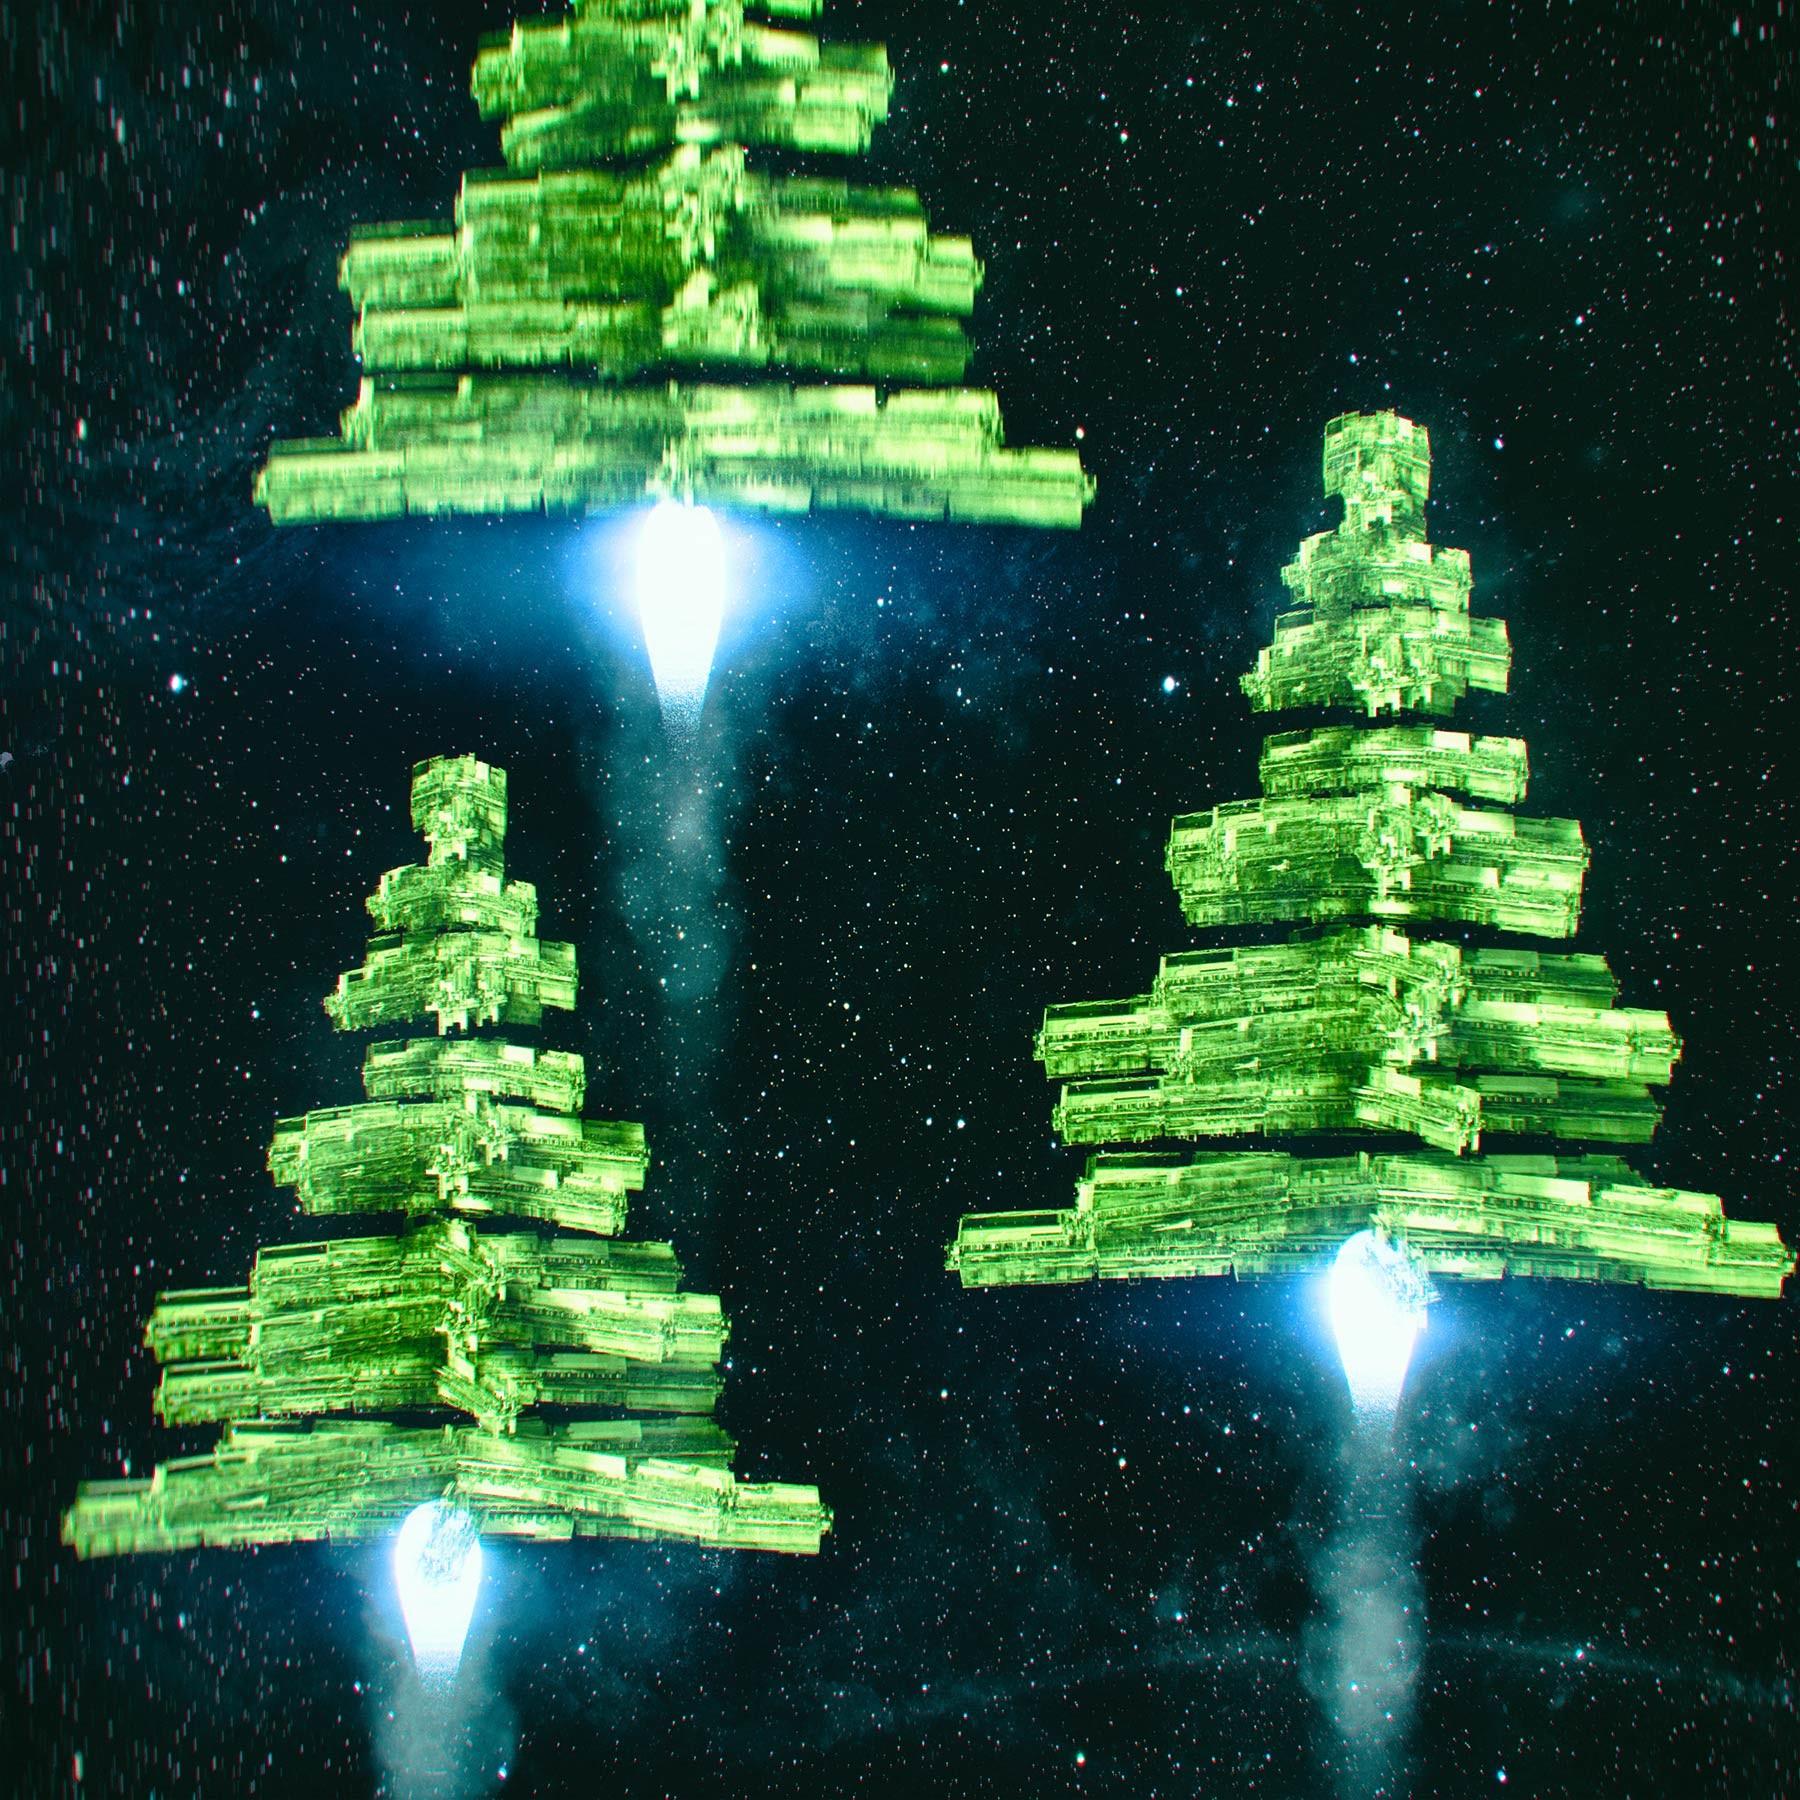 Kresimir jelusic 76 241215 space tree